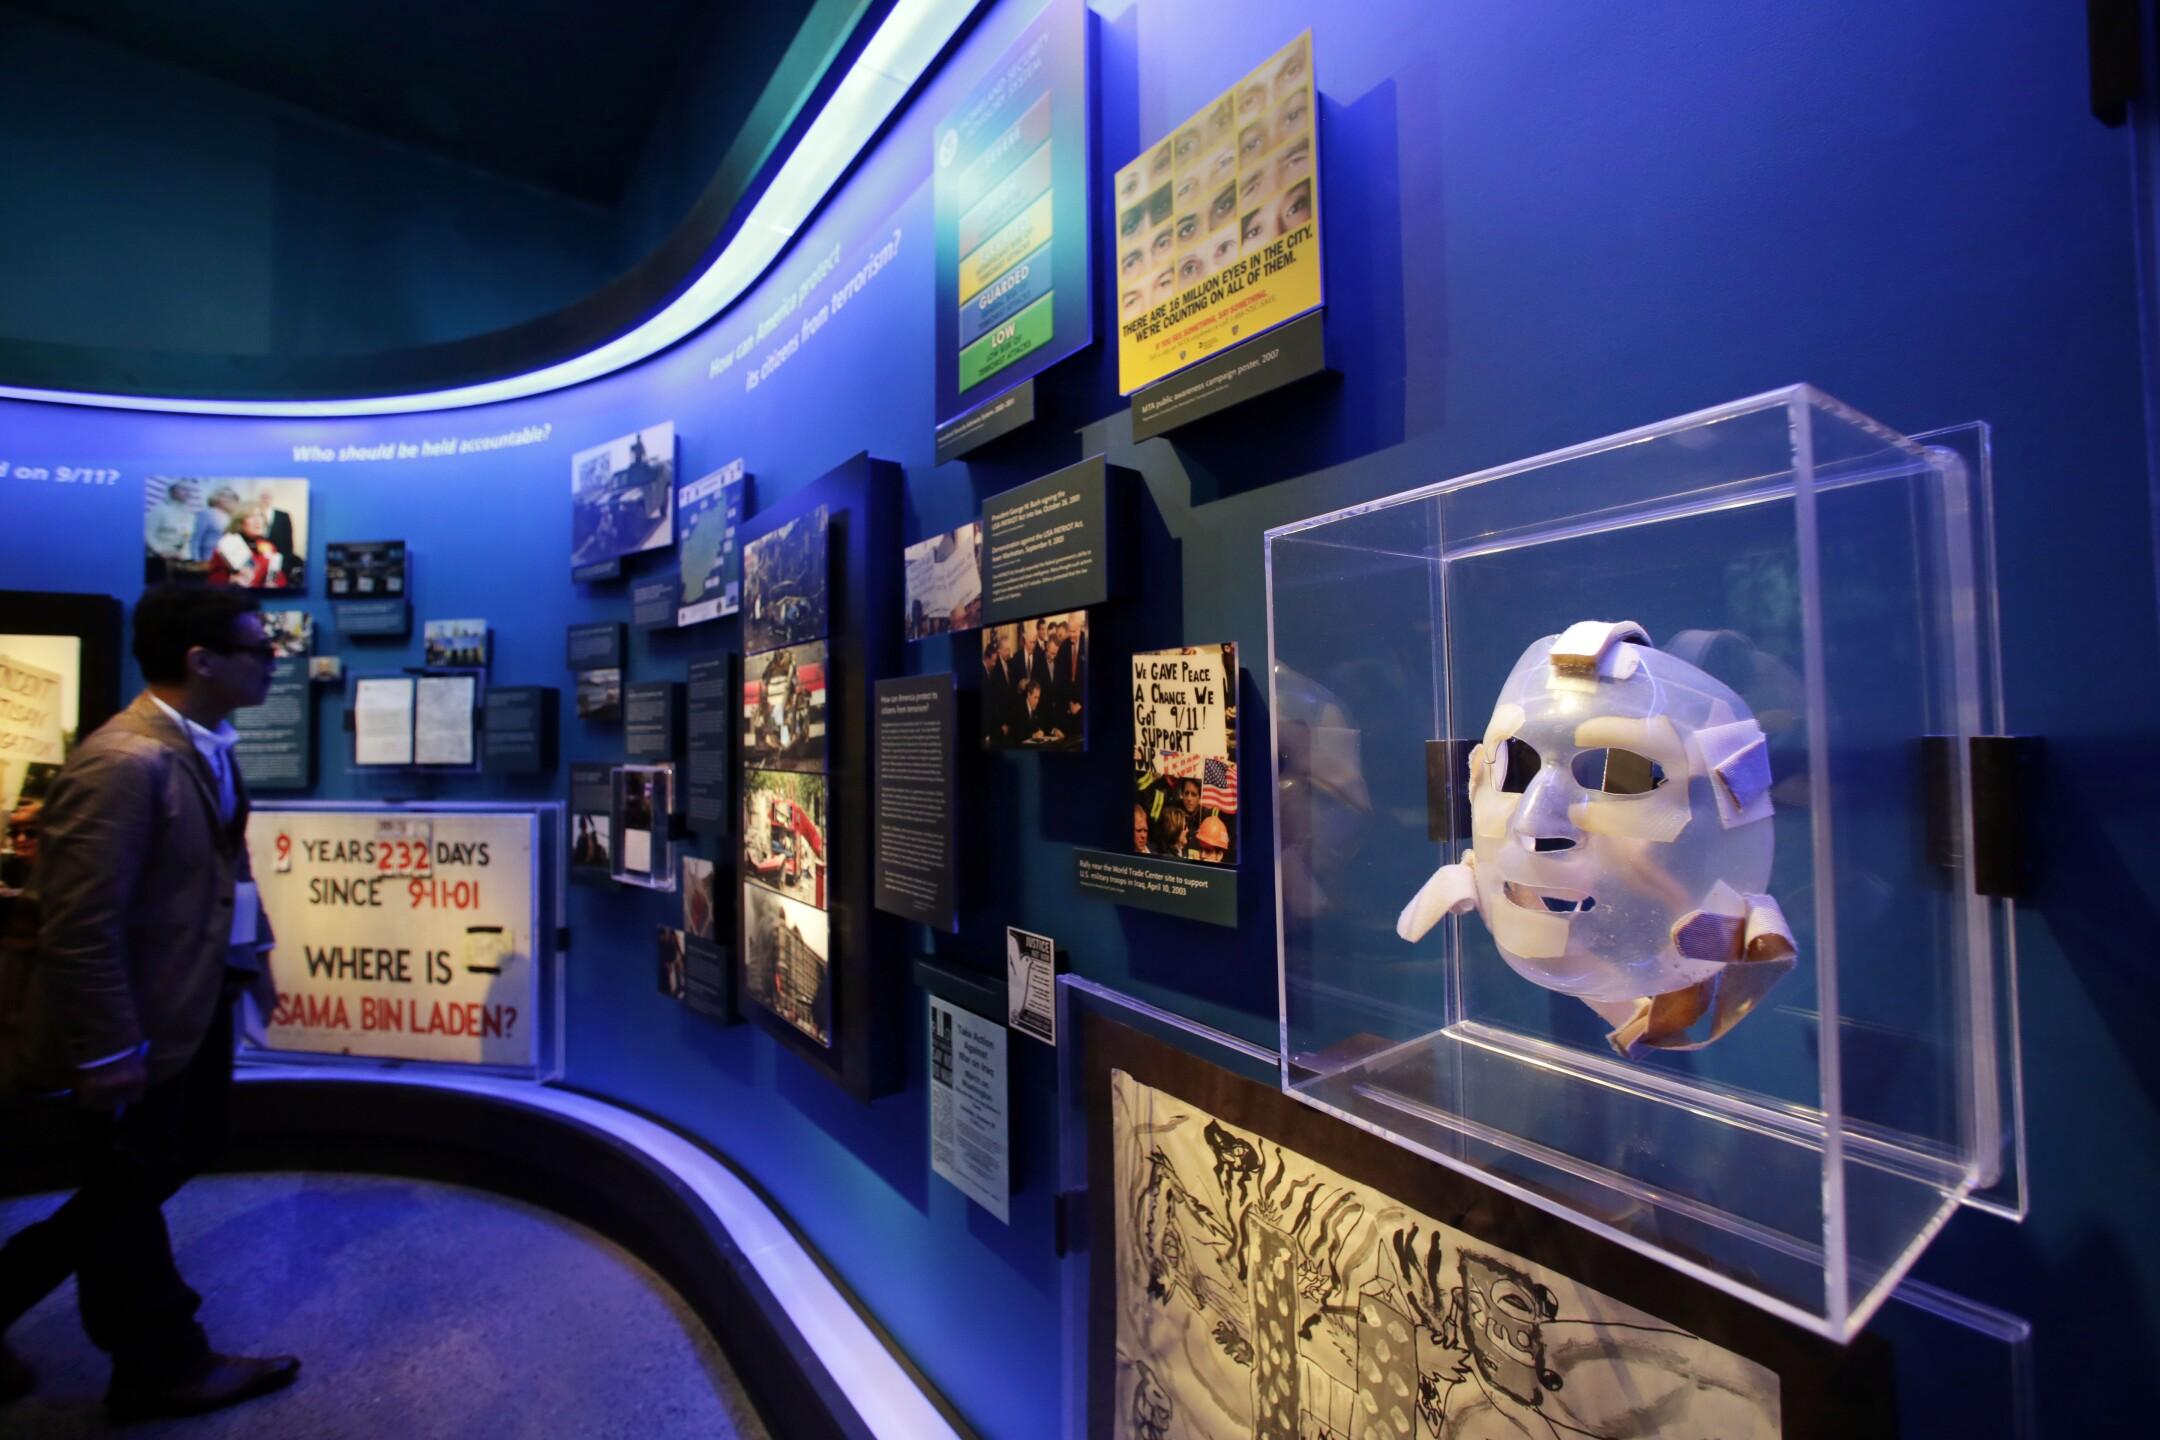 Sept 11 Museum